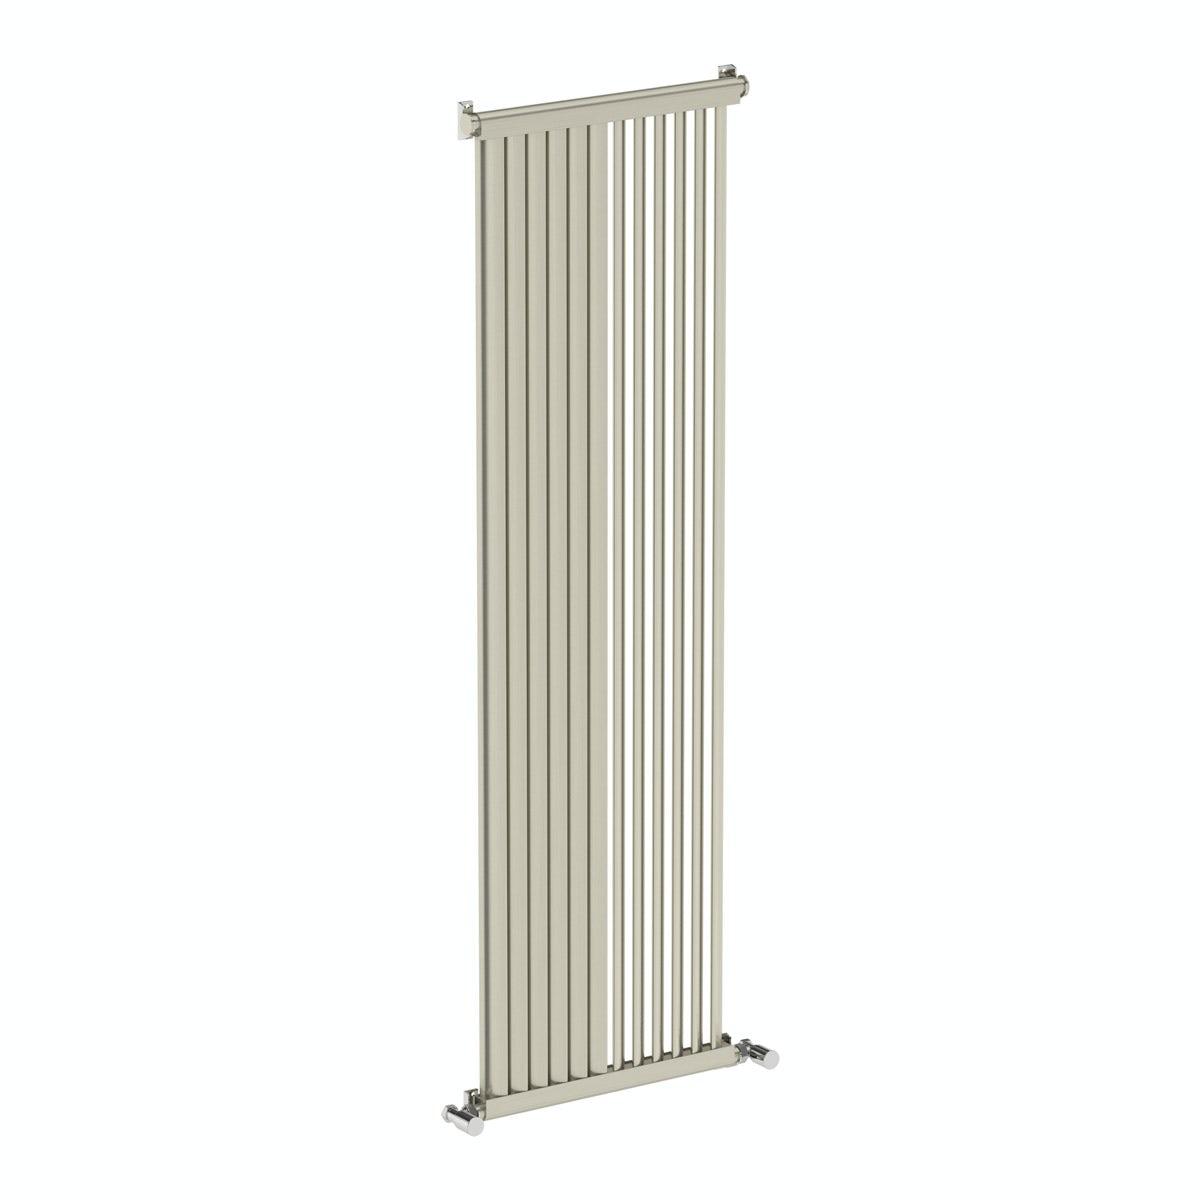 Mode Zephyra vertical radiator 1500 x 468